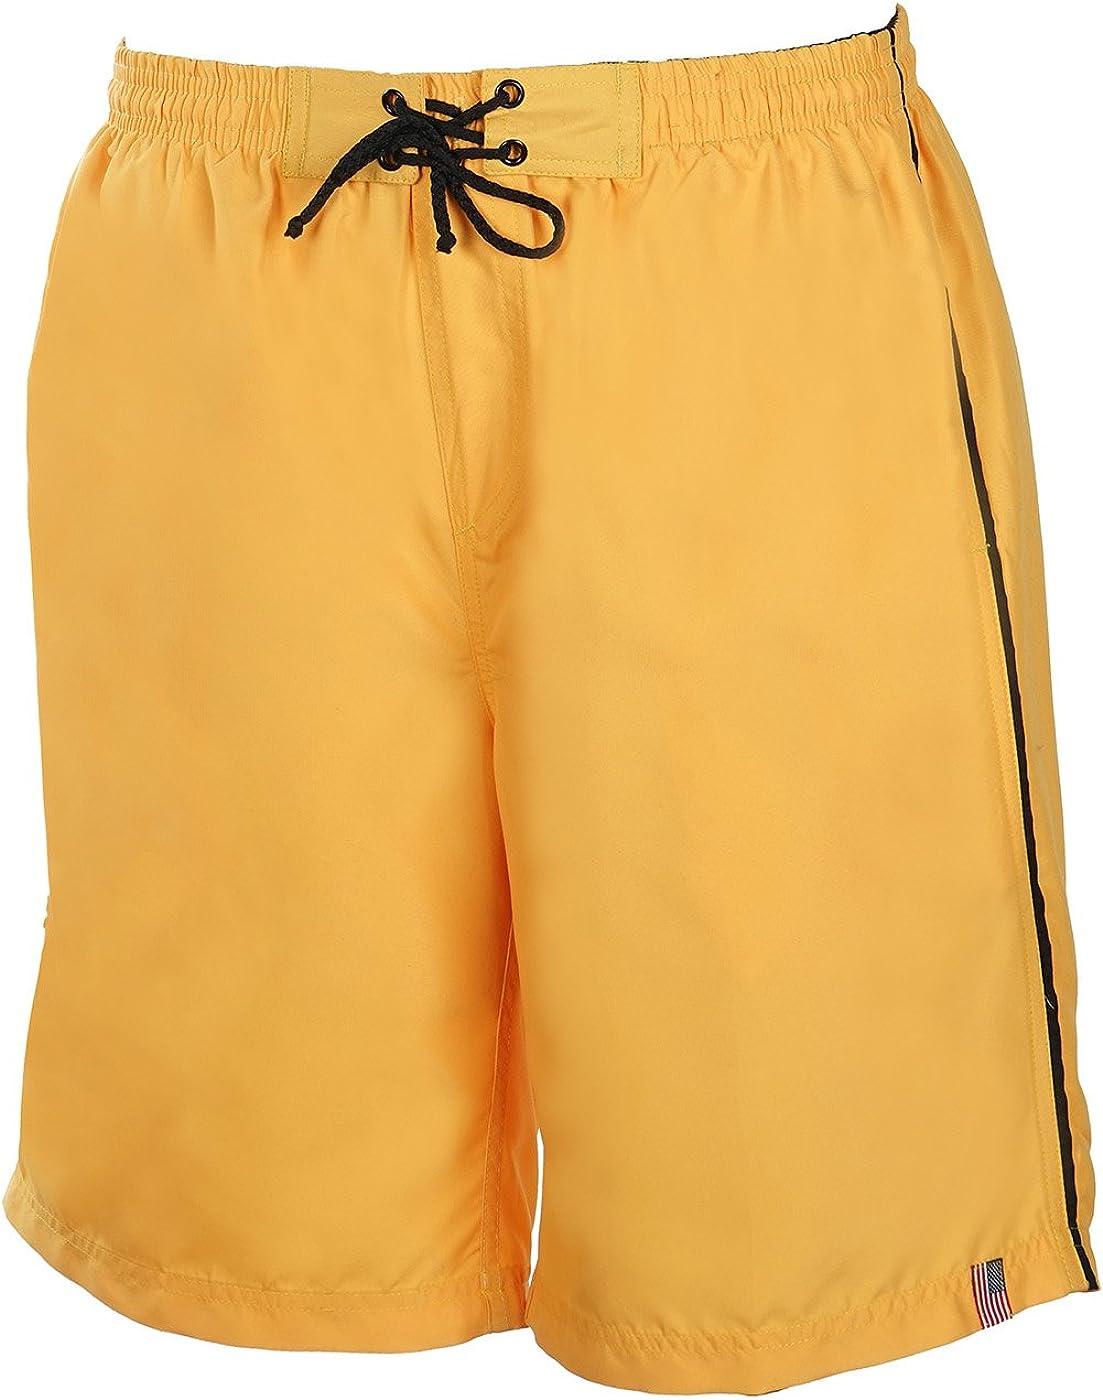 Weekender Men's Surfside Trunk shopping Swim Low price Suit